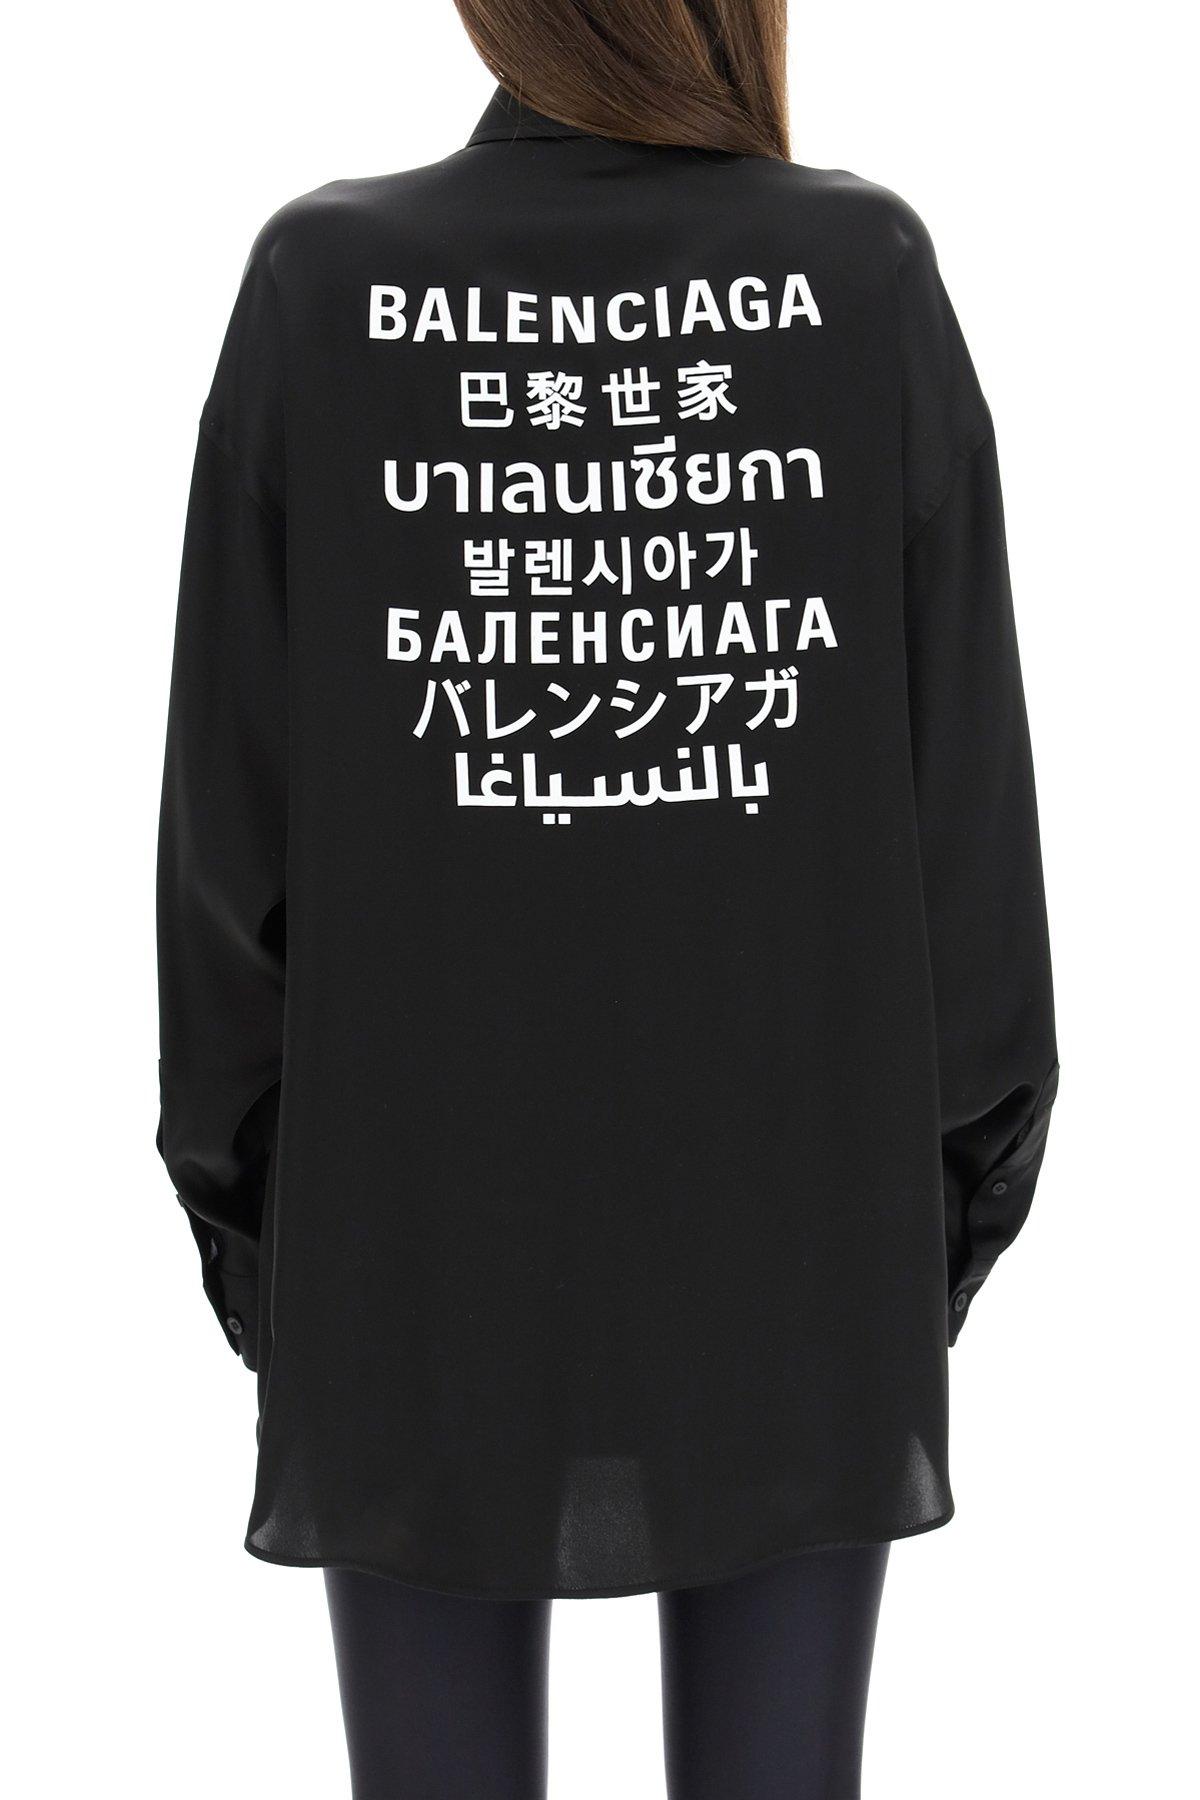 Balenciaga camicia con stampa languages